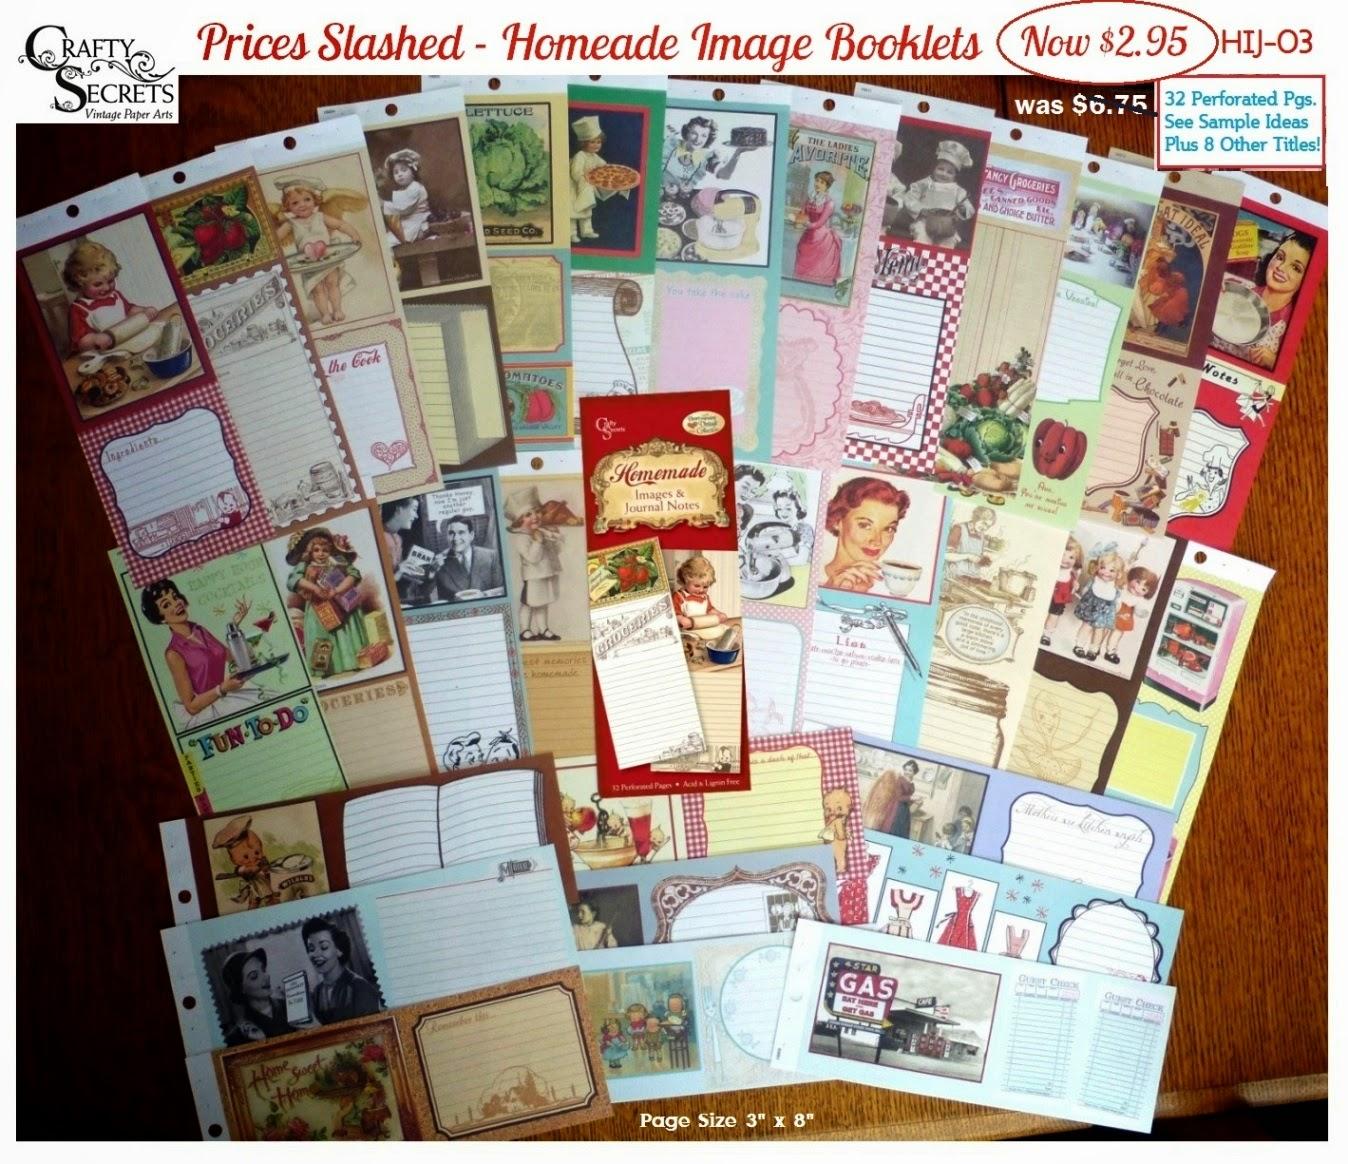 http://3.bp.blogspot.com/-ramgobb9BH0/VNlImrPmSqI/AAAAAAAASyw/m4hqLTAbquY/s1600/HIJ_03_Homemade_booklet-samples.jpg